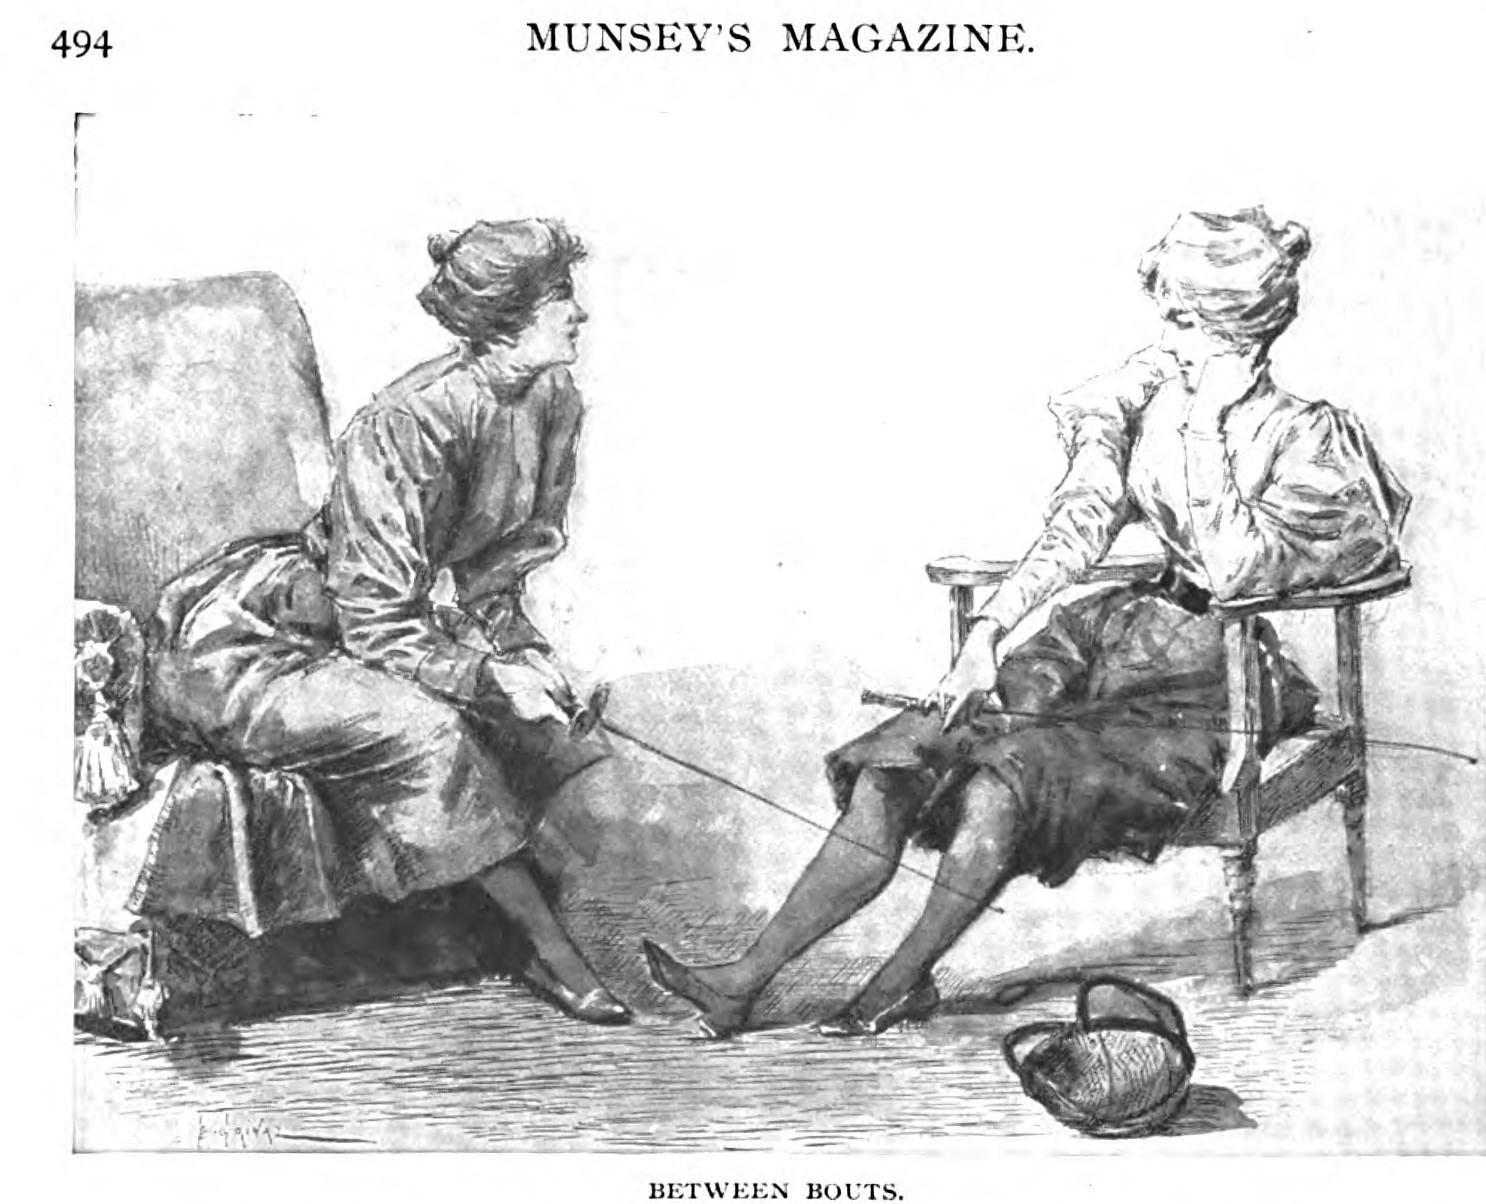 A modern sportswoman, Munsey's Magazine, juillet 1897, p 494